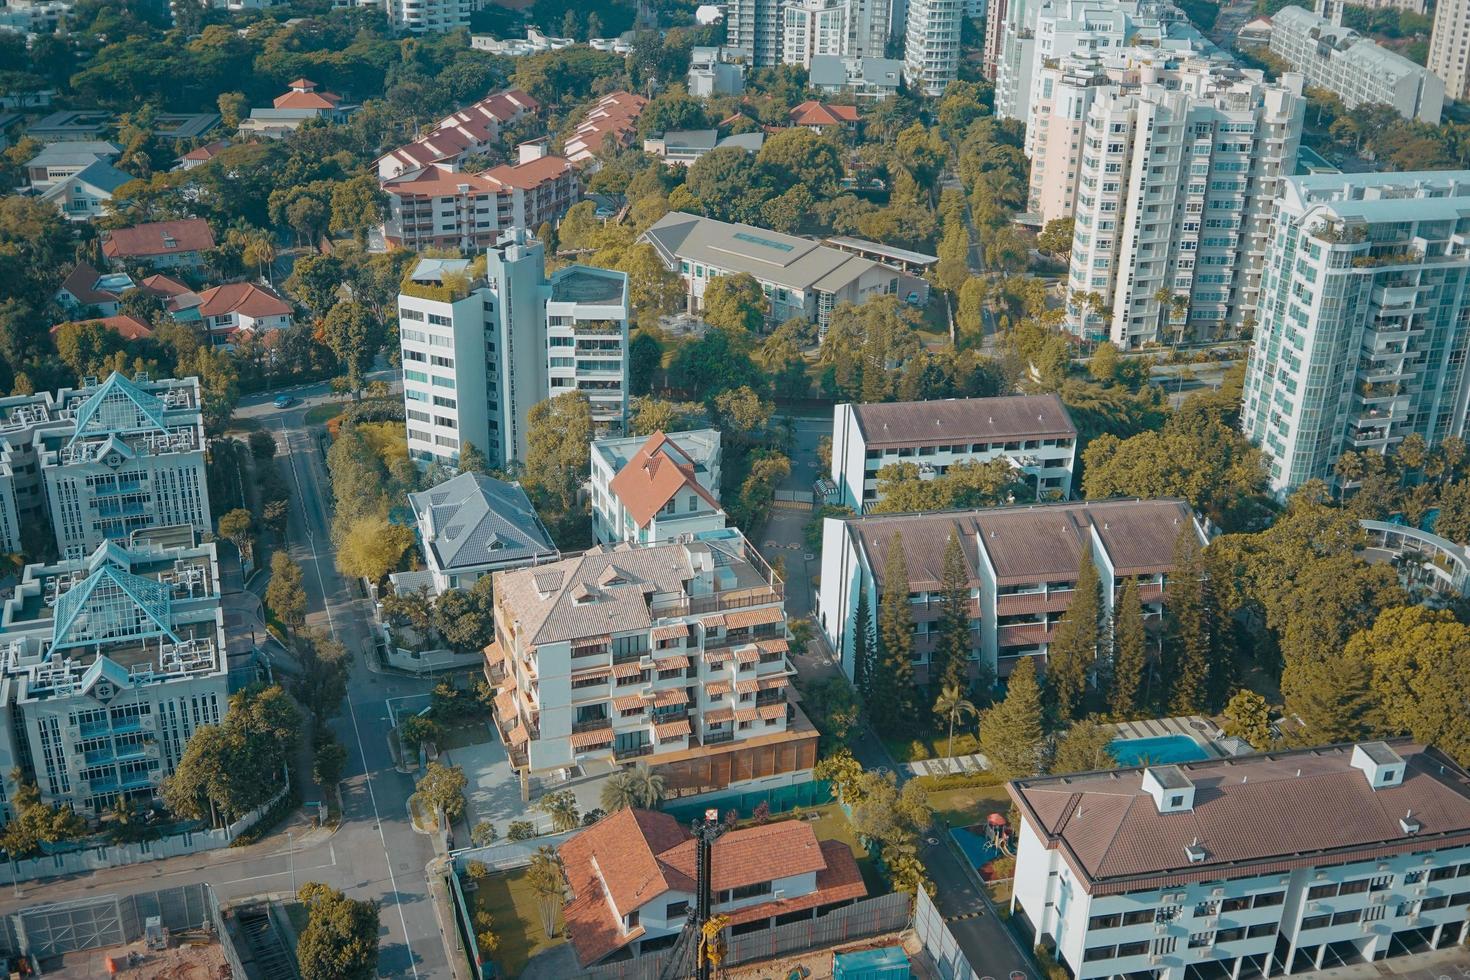 vue aérienne du paysage urbain urbain photo